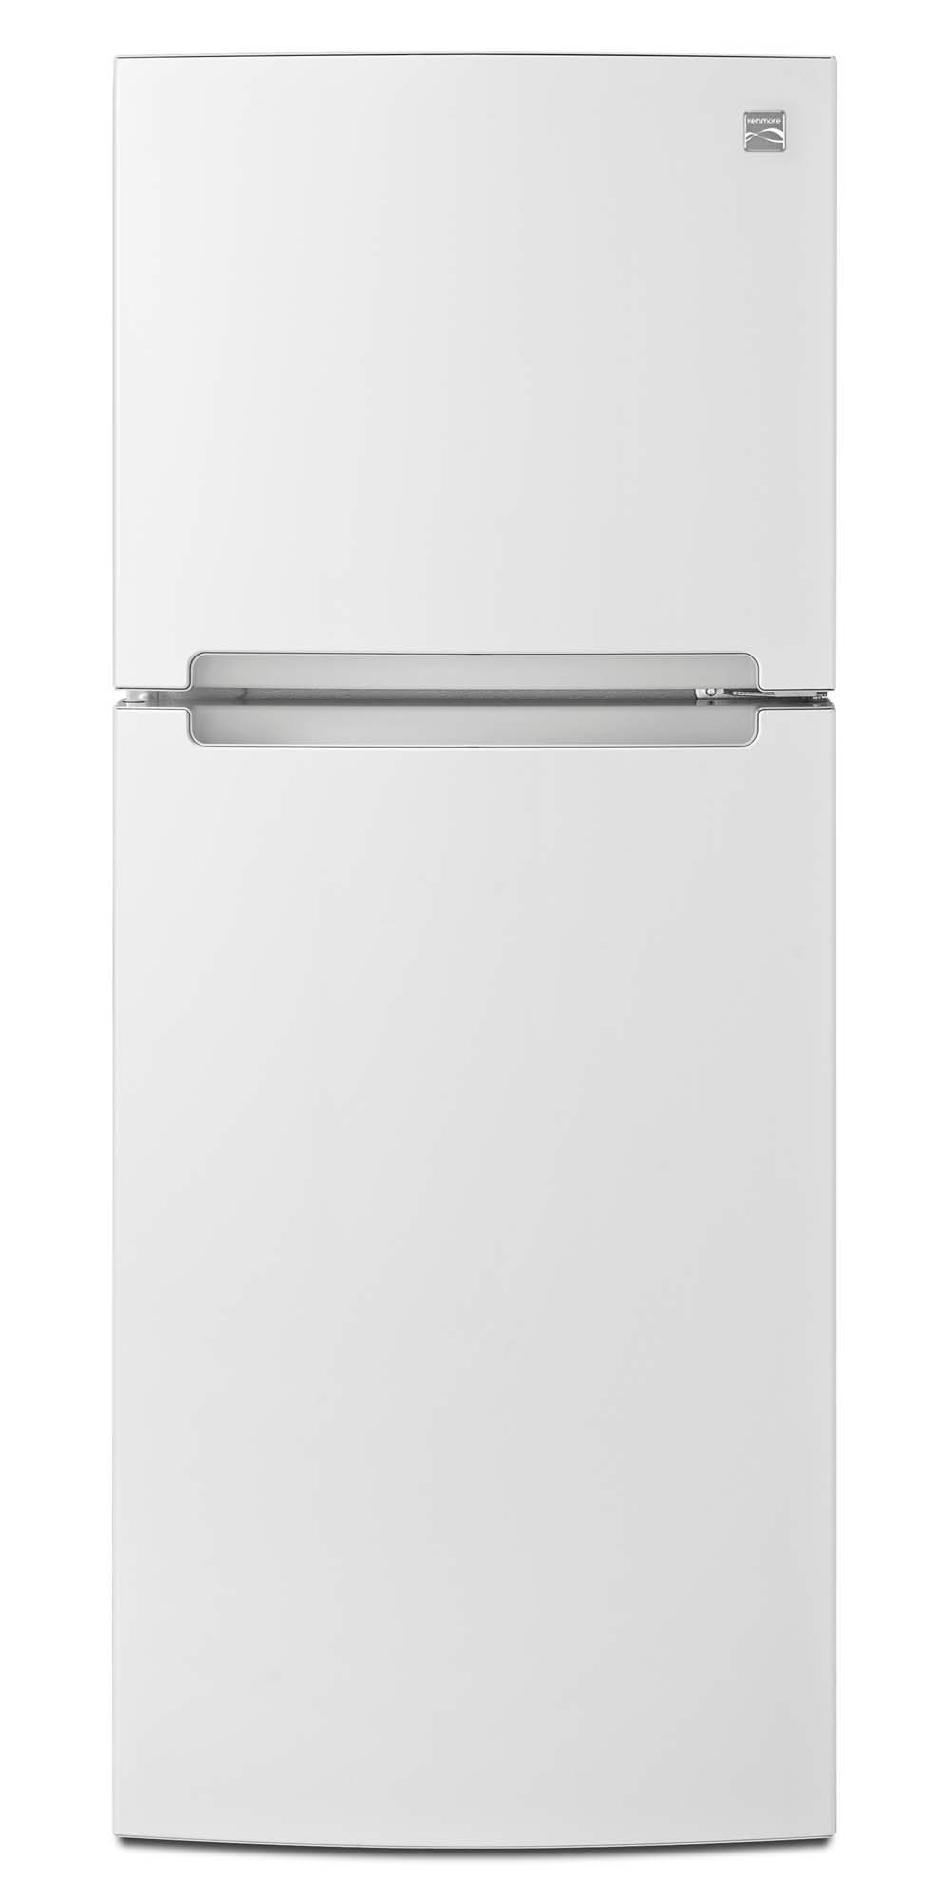 10.7 cu. ft. Top-Freezer Refrigerator w/